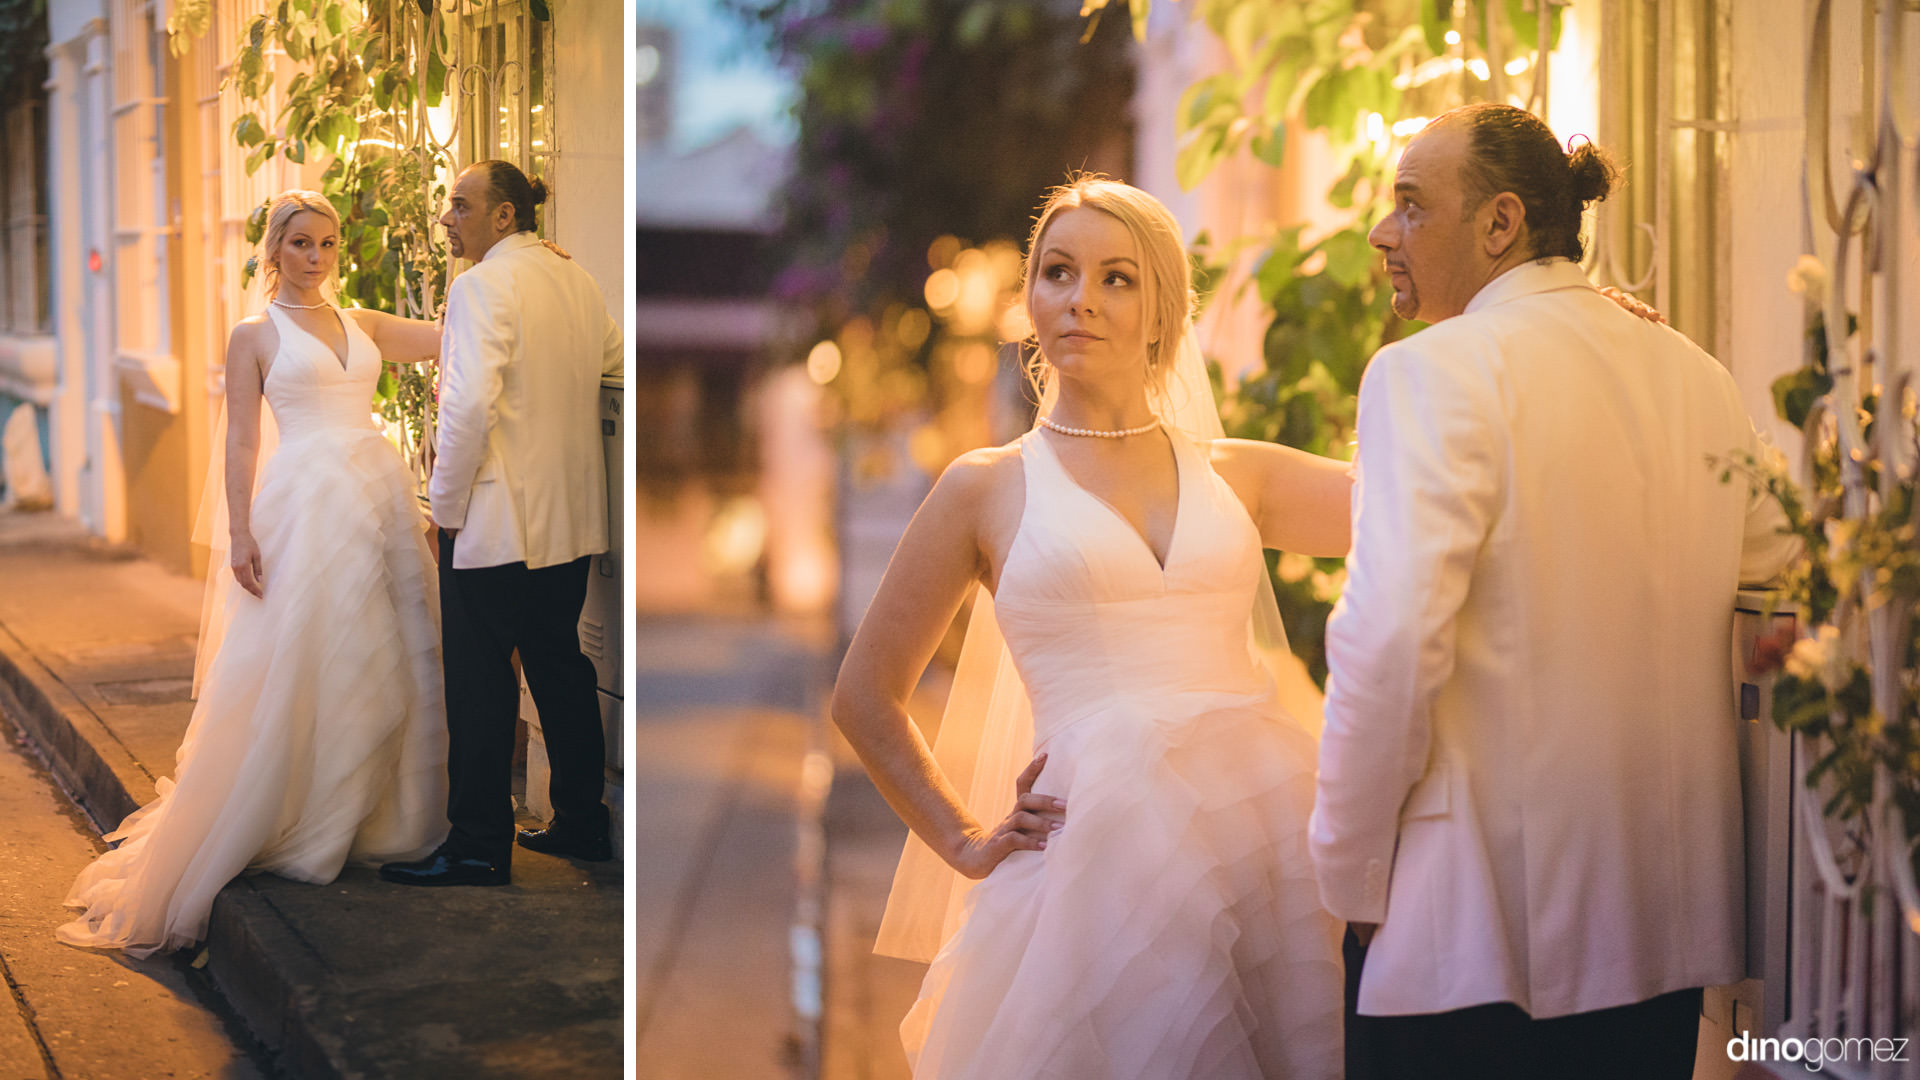 Cartagena Wedding Photographer At Hotel La Artilleria - St